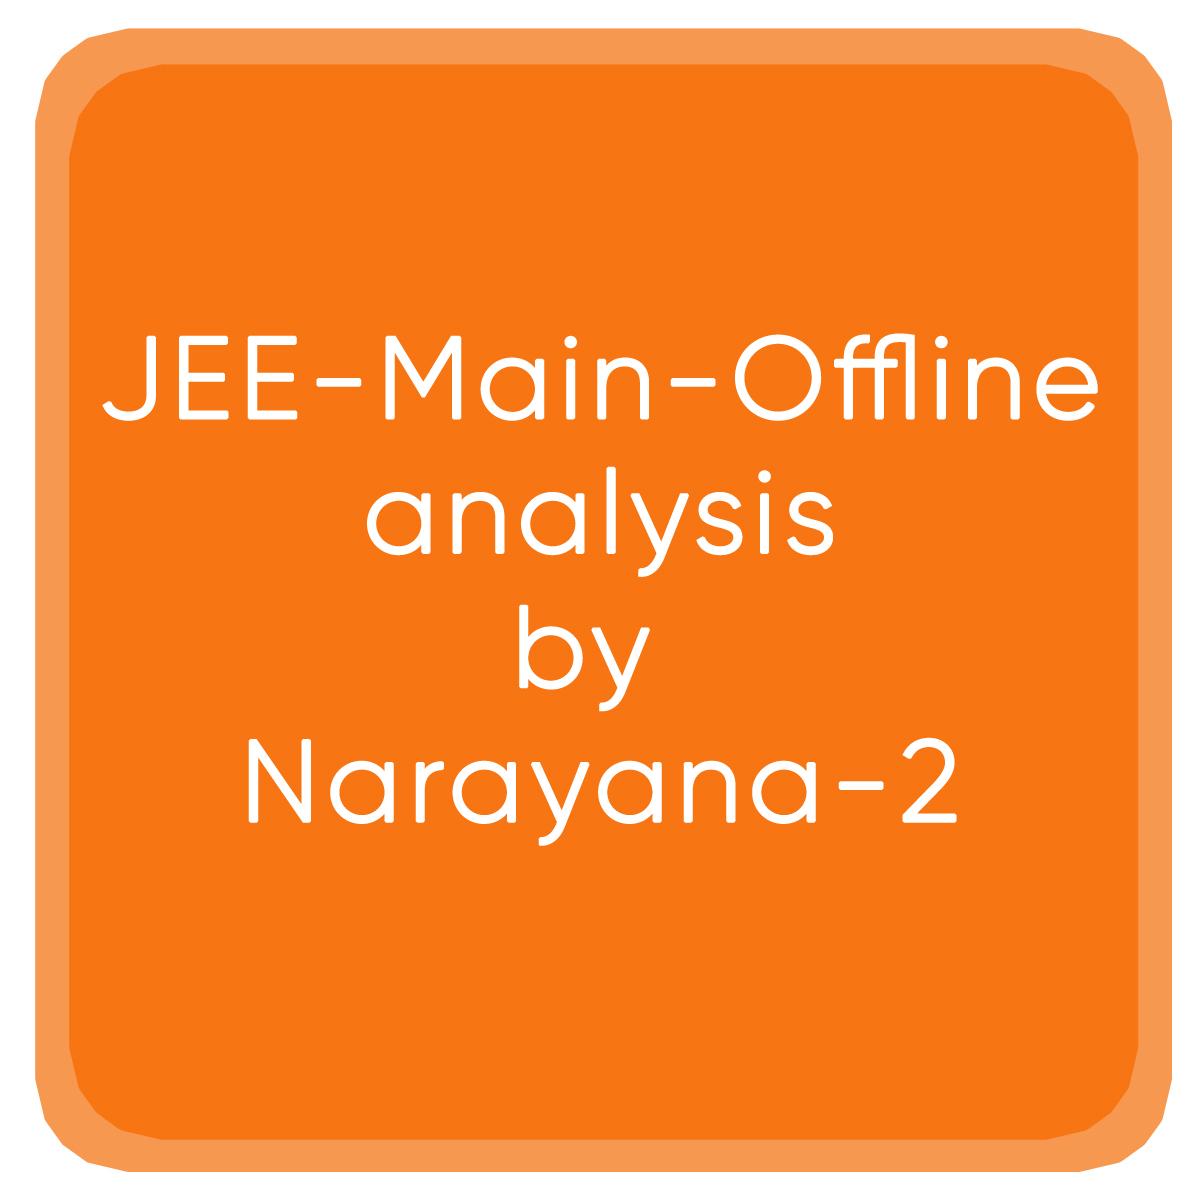 JEE-Main-Offline-analysis-by Narayana-2